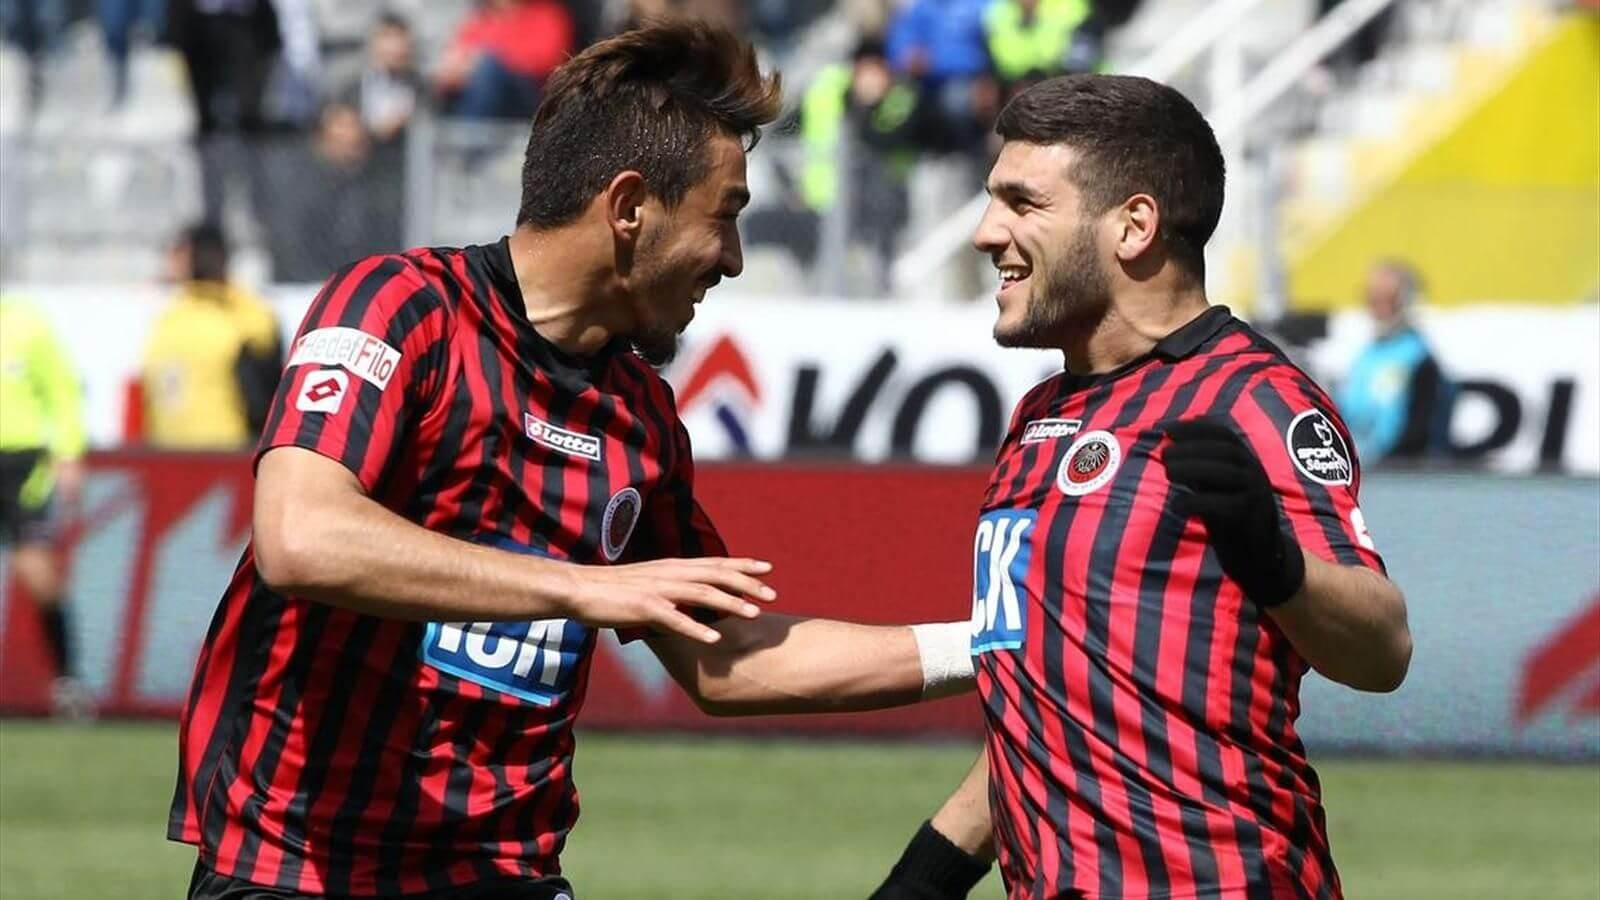 Ponturi pariuri – Bursaspor – Genclerbirligi – Cupa Turciei